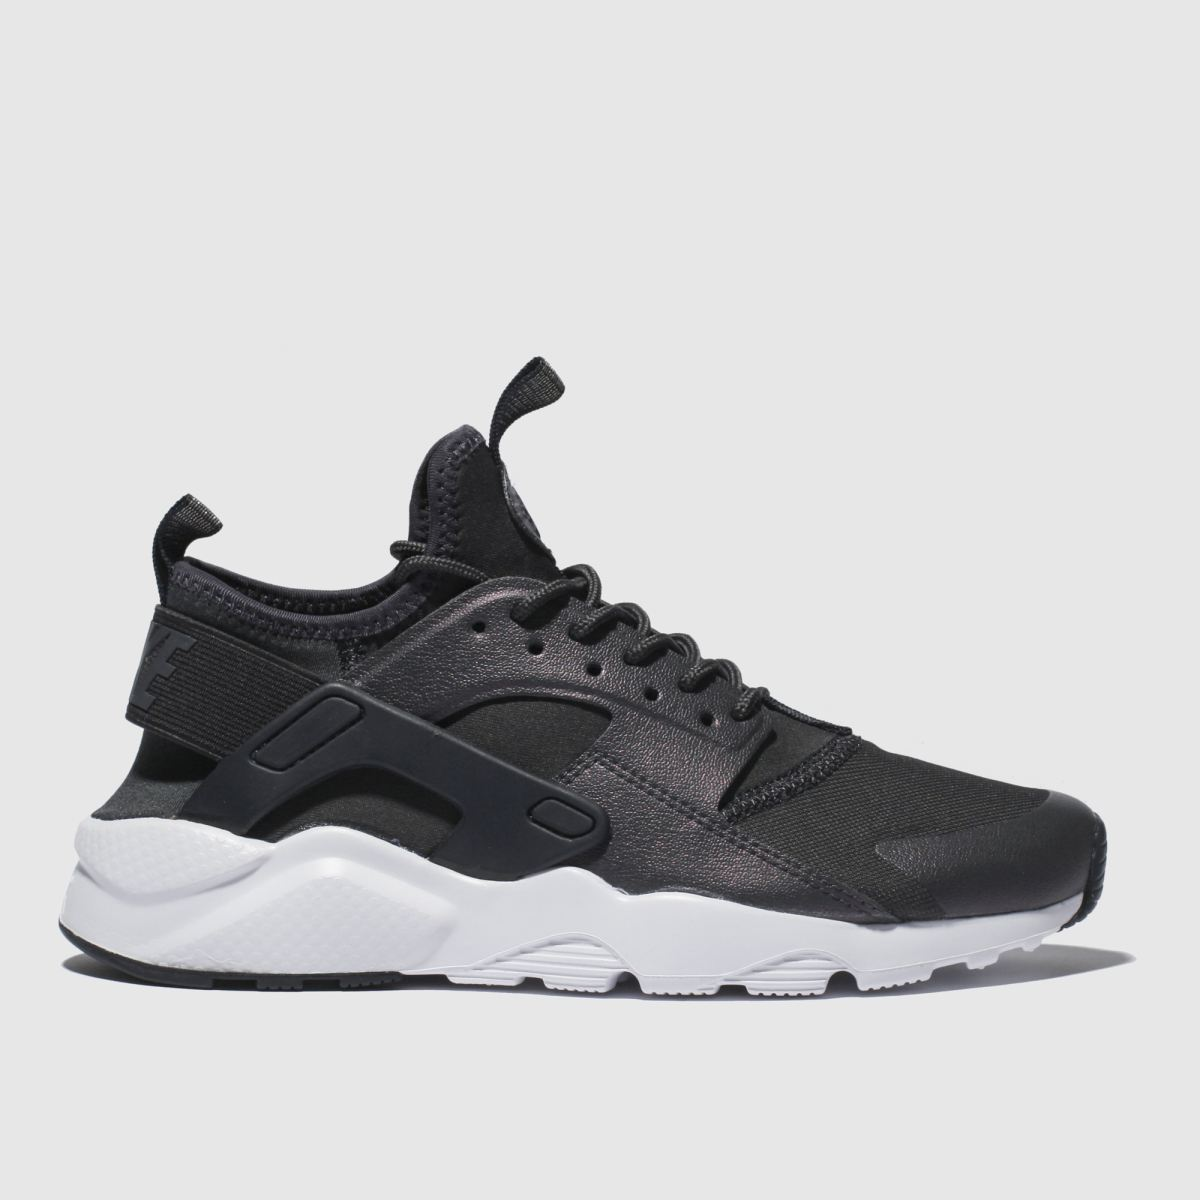 Nike Dark Grey Huarache Run Ultra Premium Trainers Youth